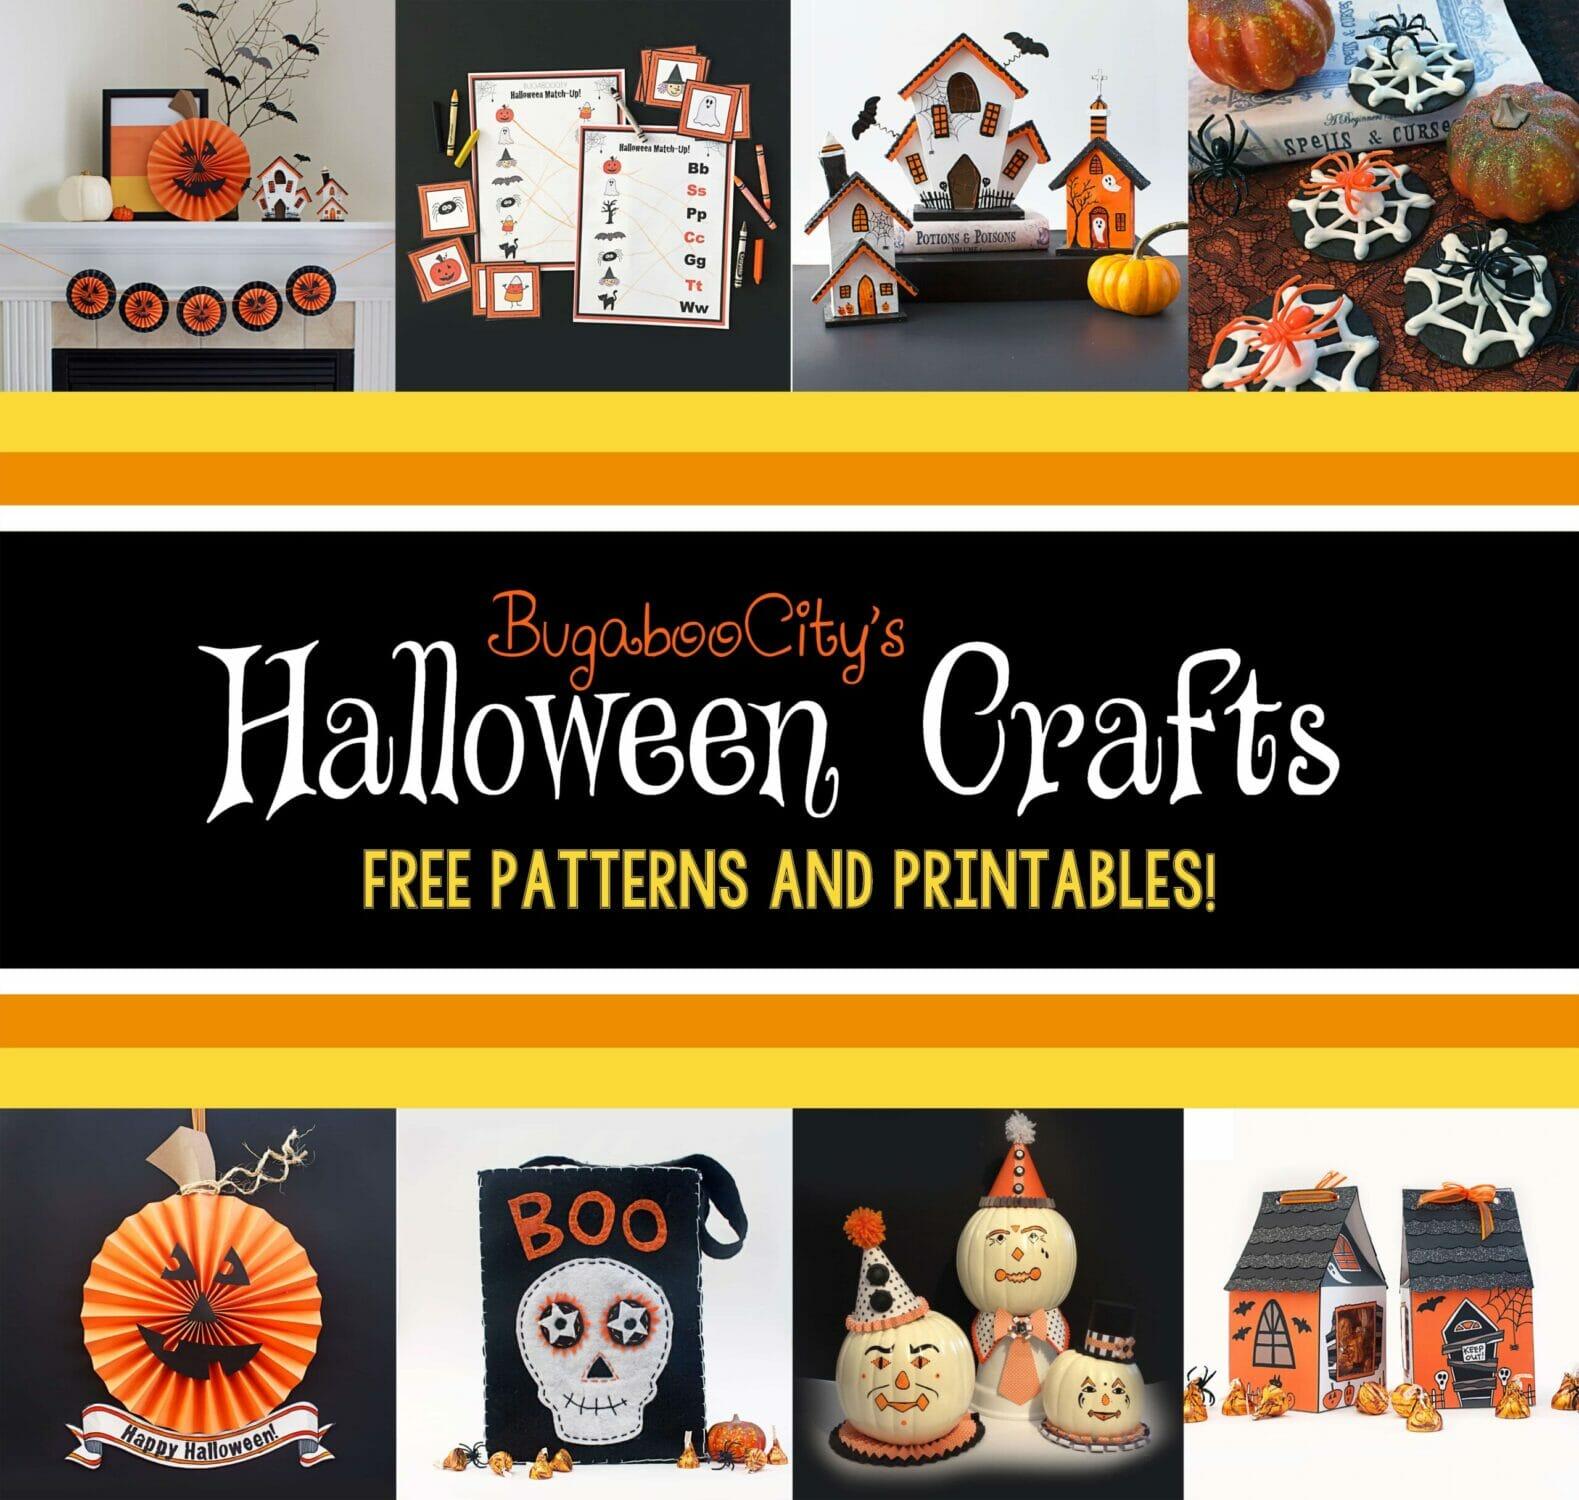 10 Spooky DIY Halloween Crafts